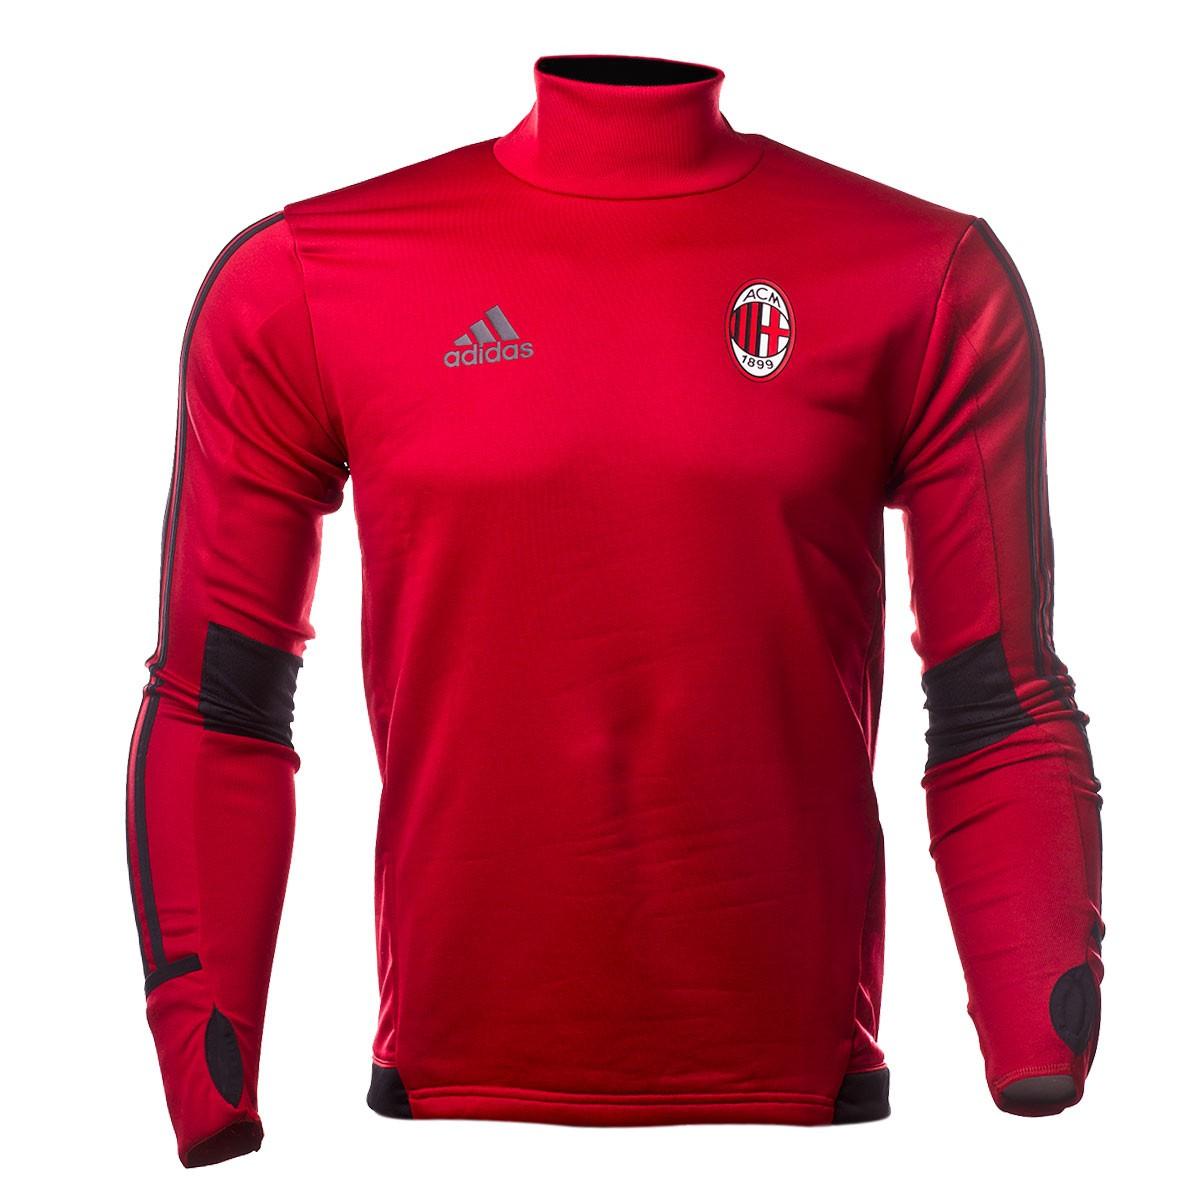 sudadera adidas football 2017